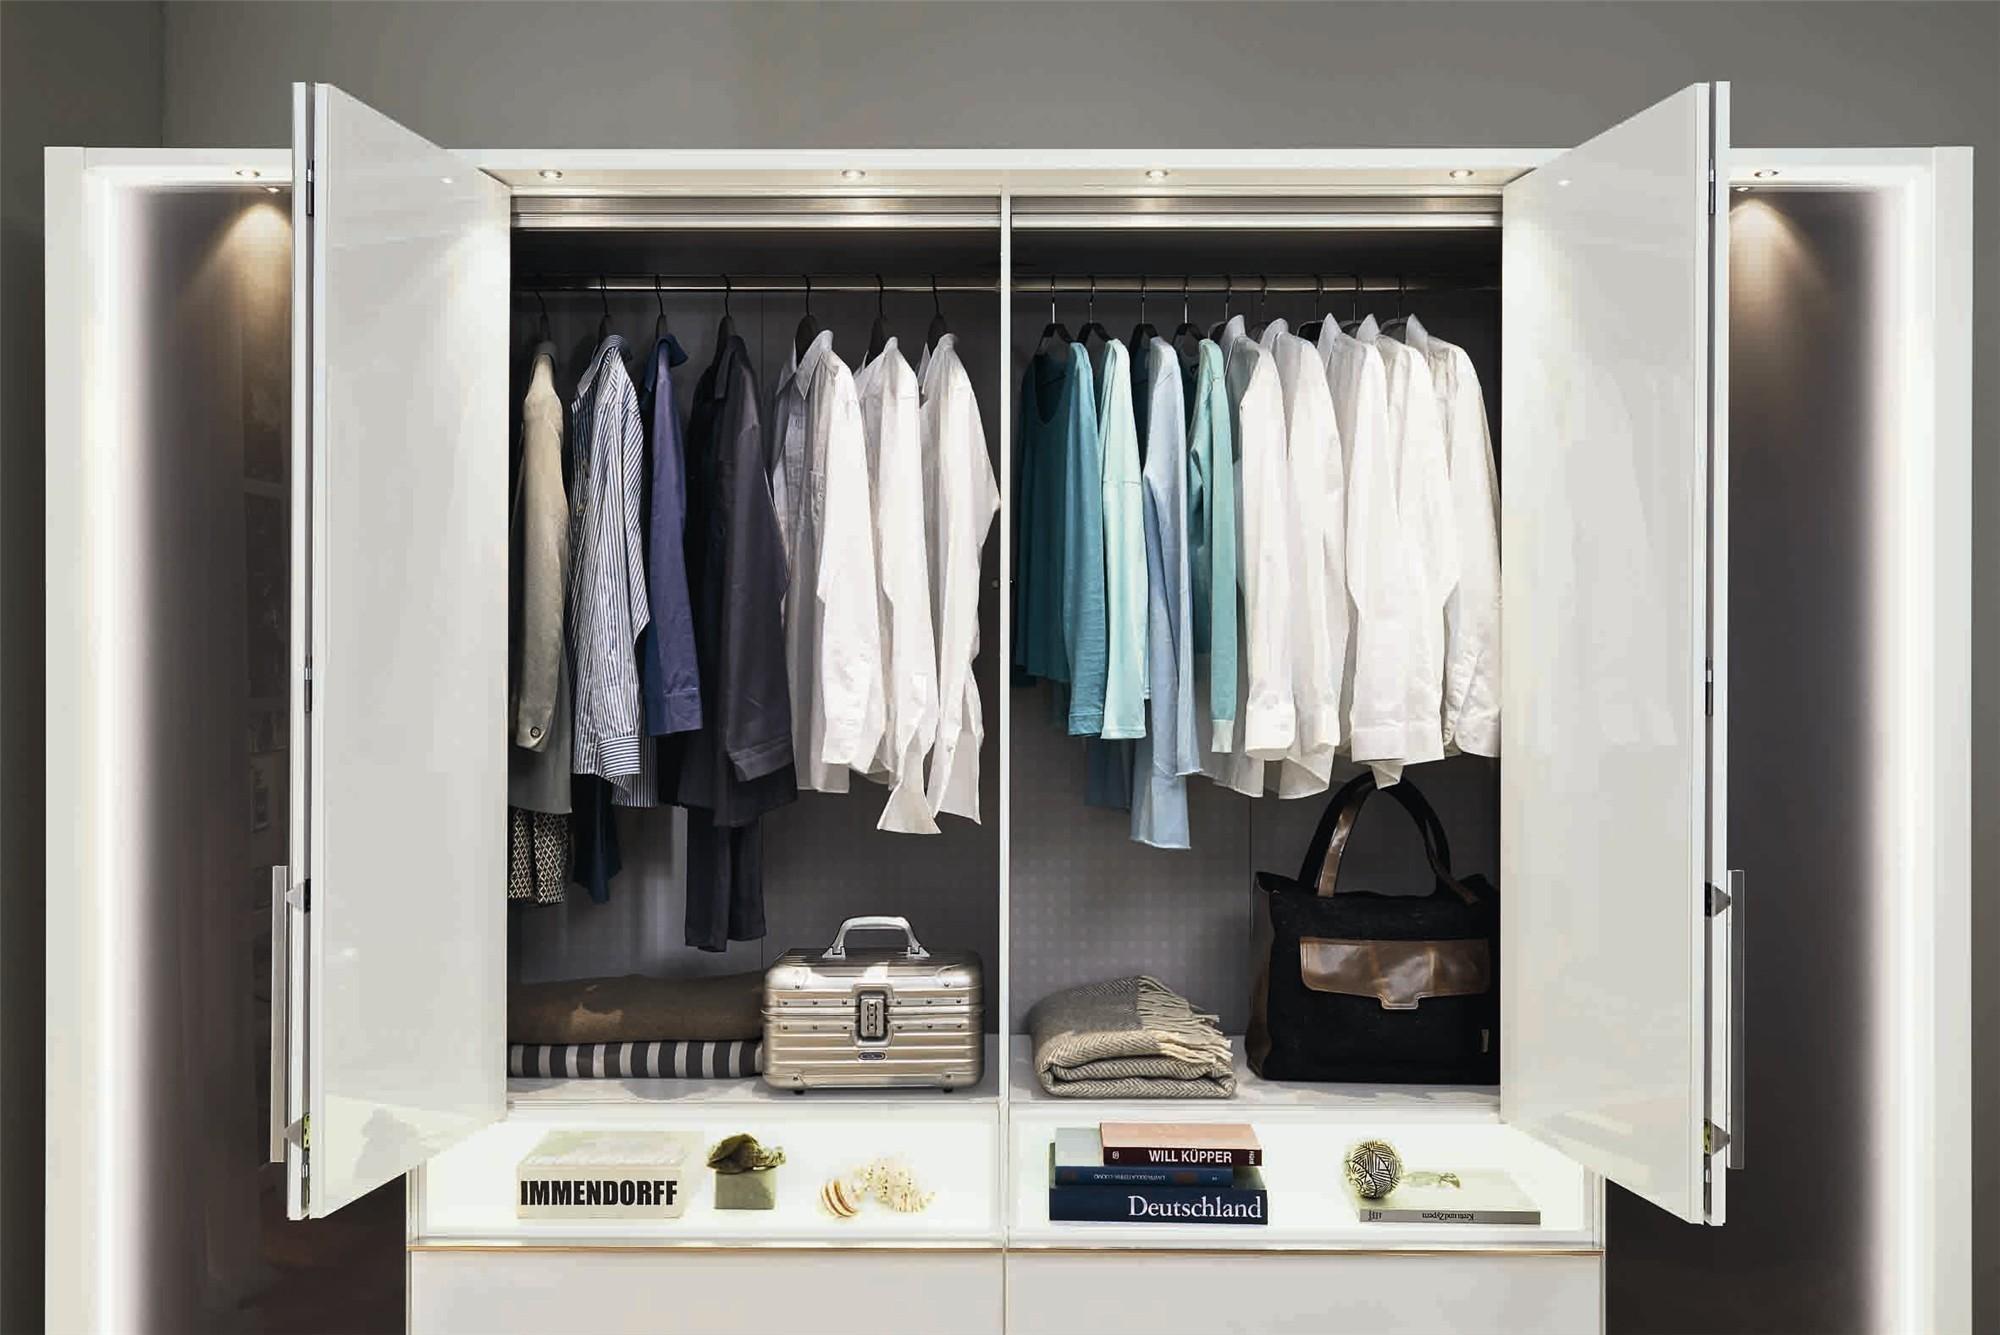 Типы шкафа-купе для спальни